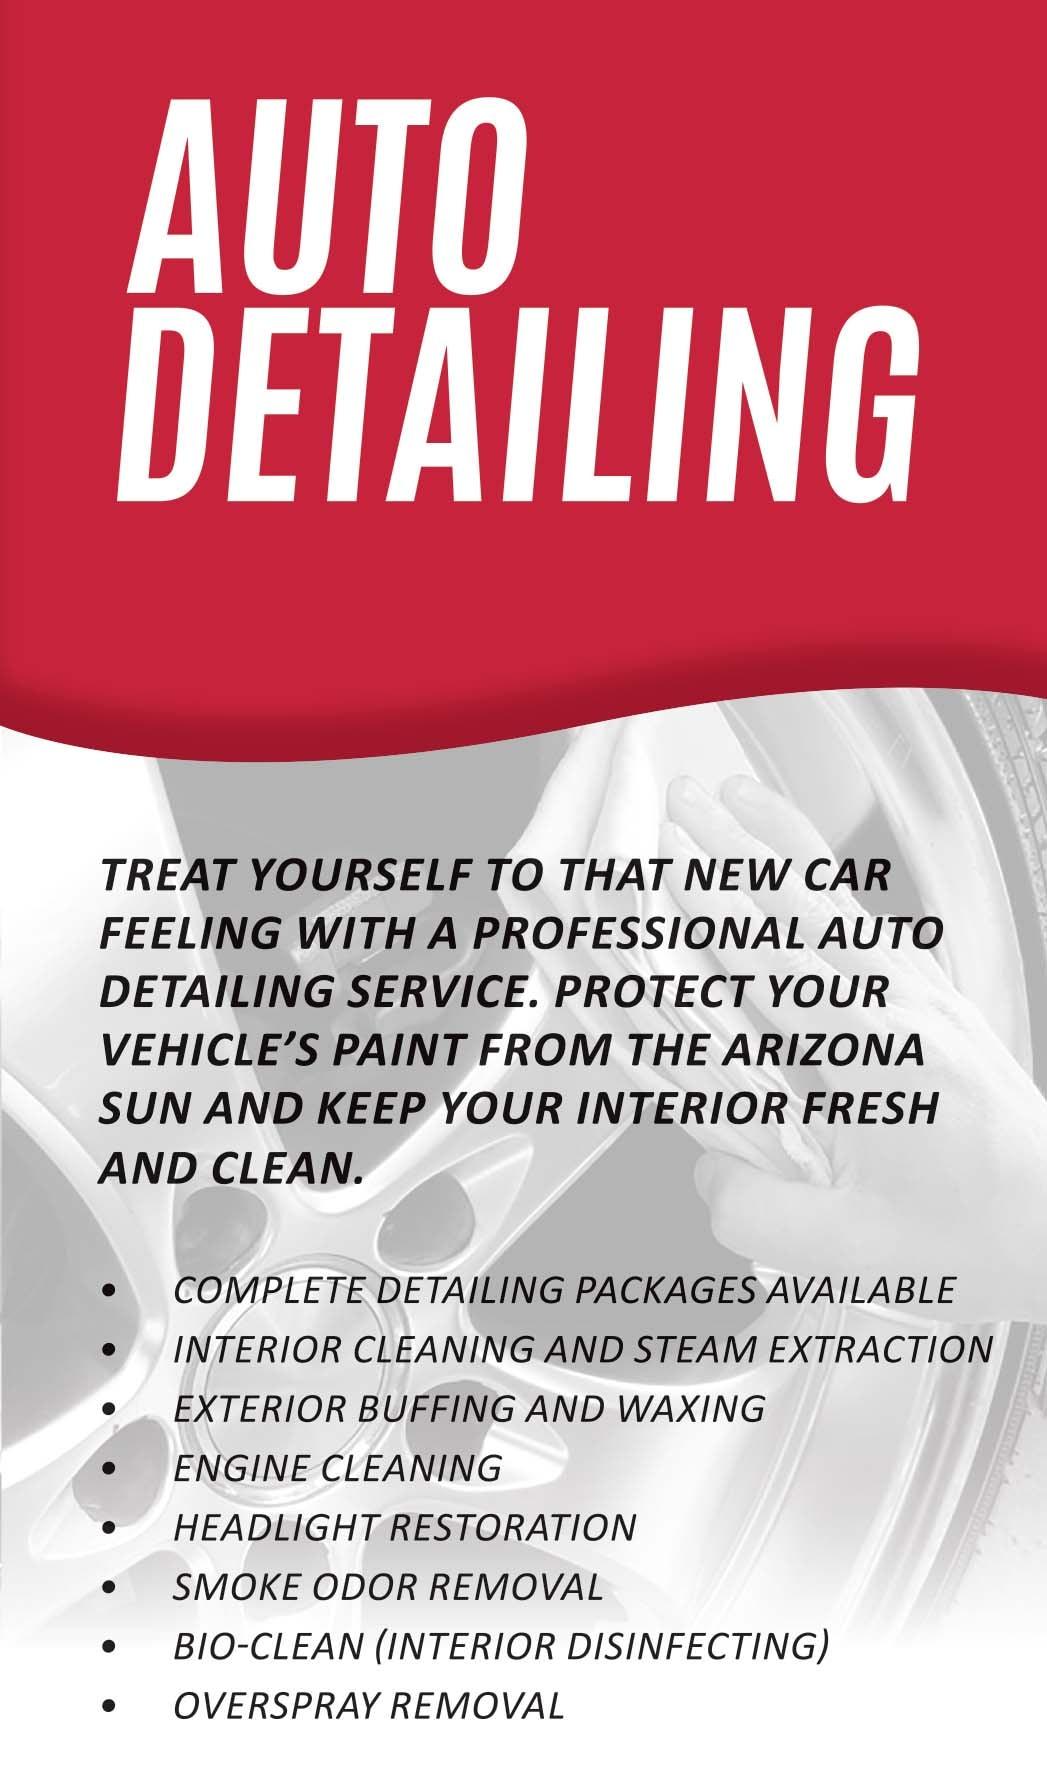 Bill luke tempe new fiat alfa romeo dealership in tempe - Vehicle interior cleaning service ...